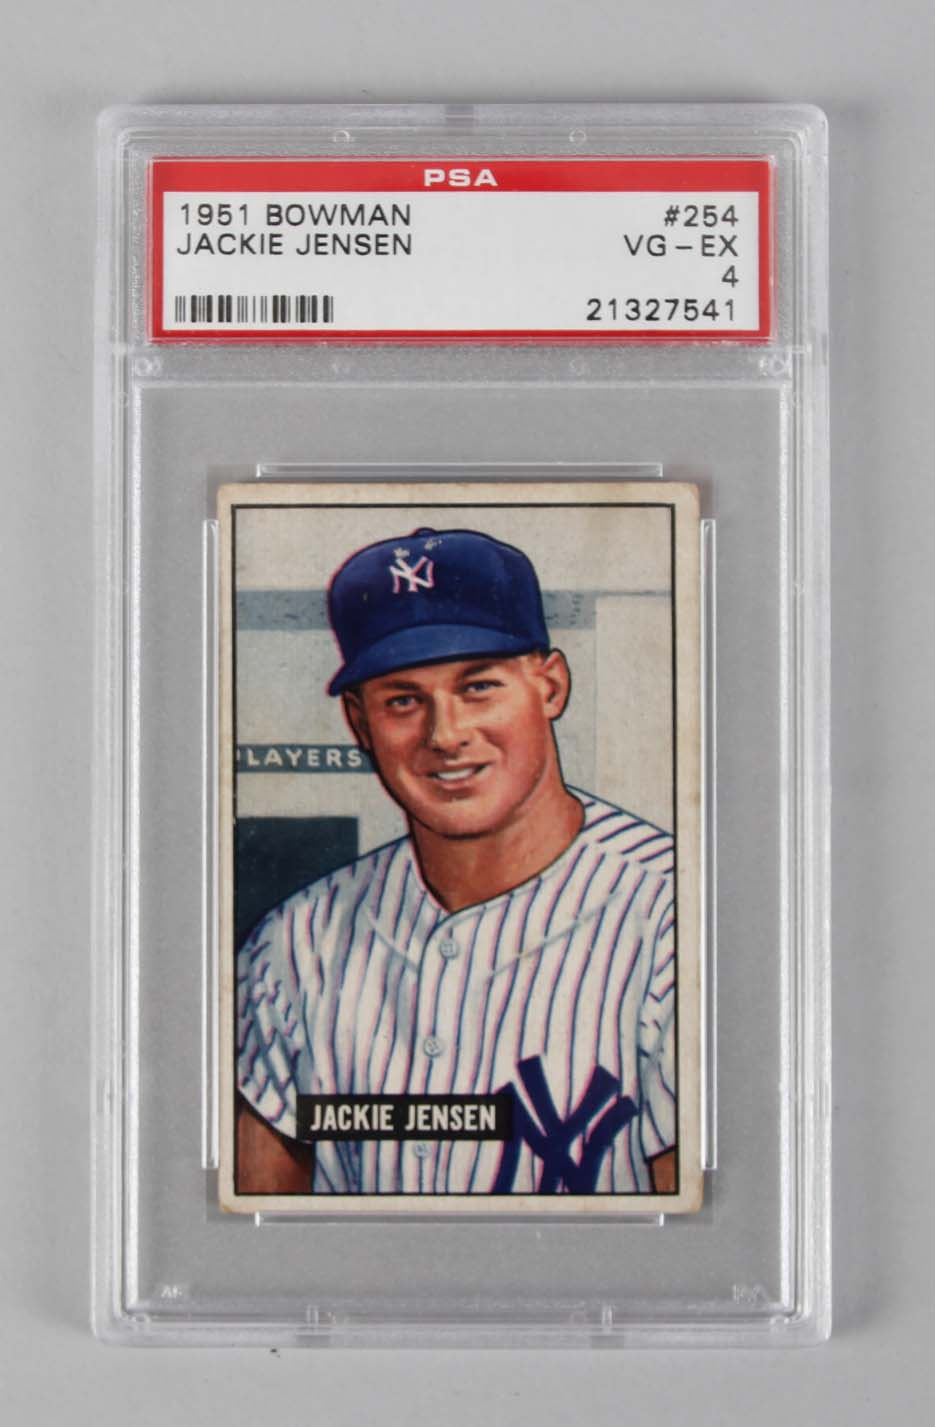 1951 Bowman Ny Yankees Jackie Jensen Graded Baseball Card Psa Vg Ex 4